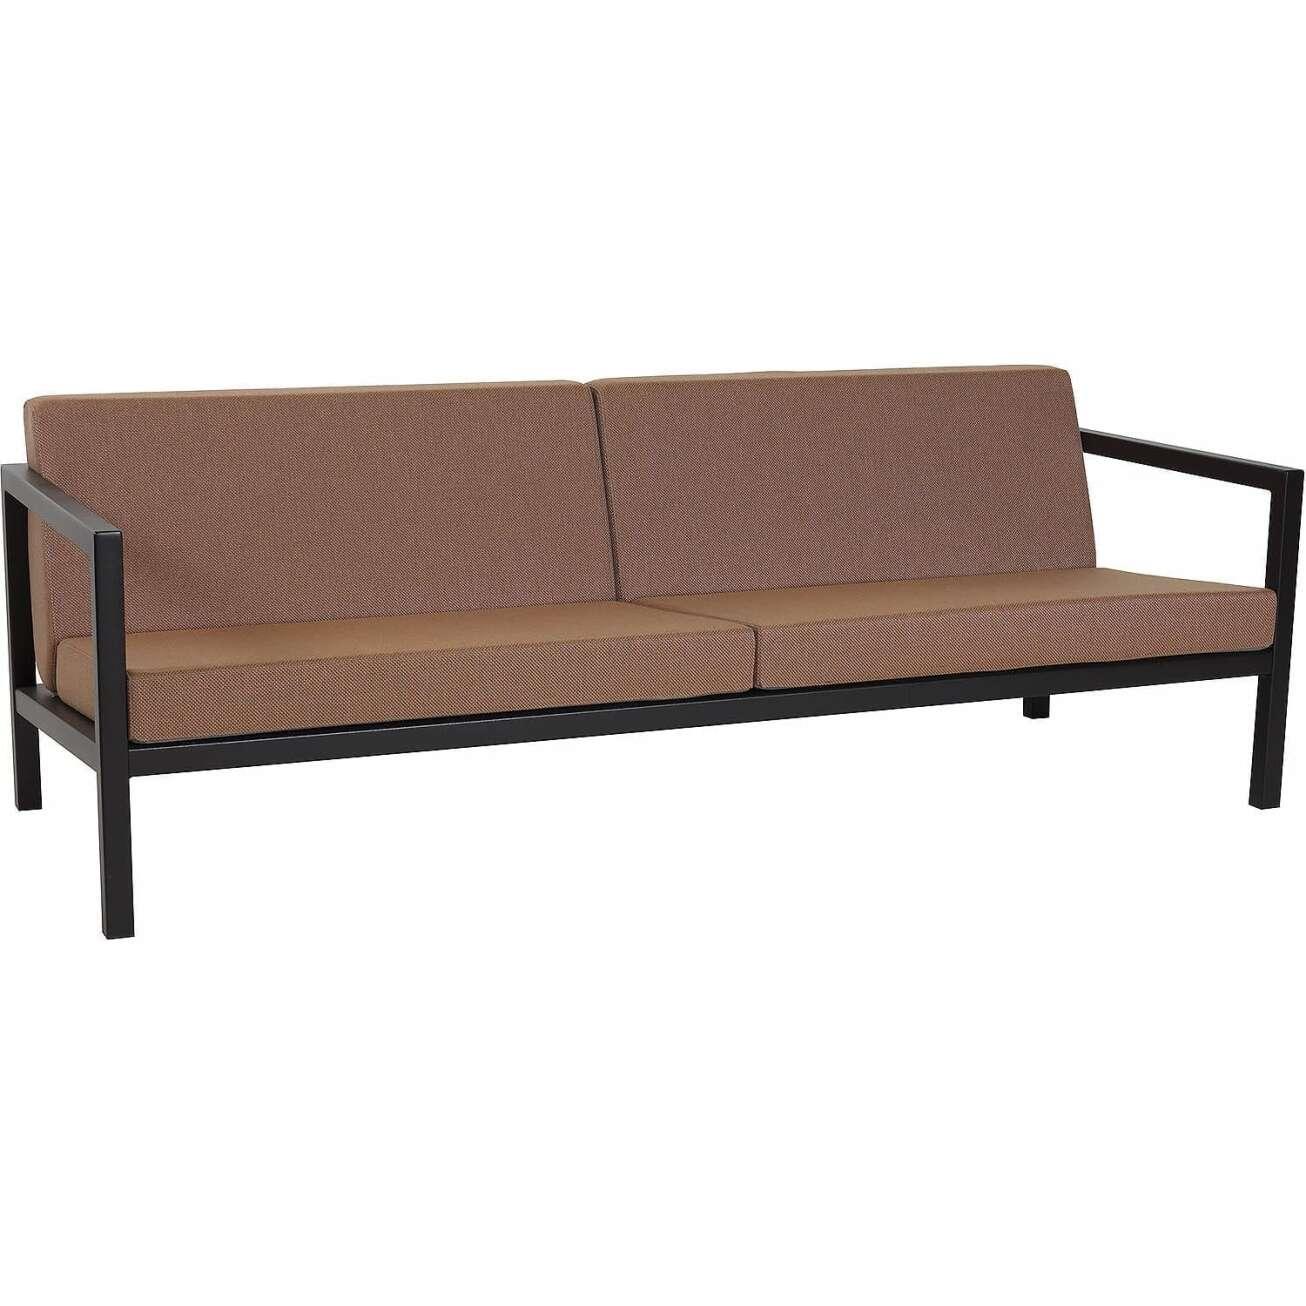 Sundays Frame 3-seter sofa i sort aluminium med brune puter